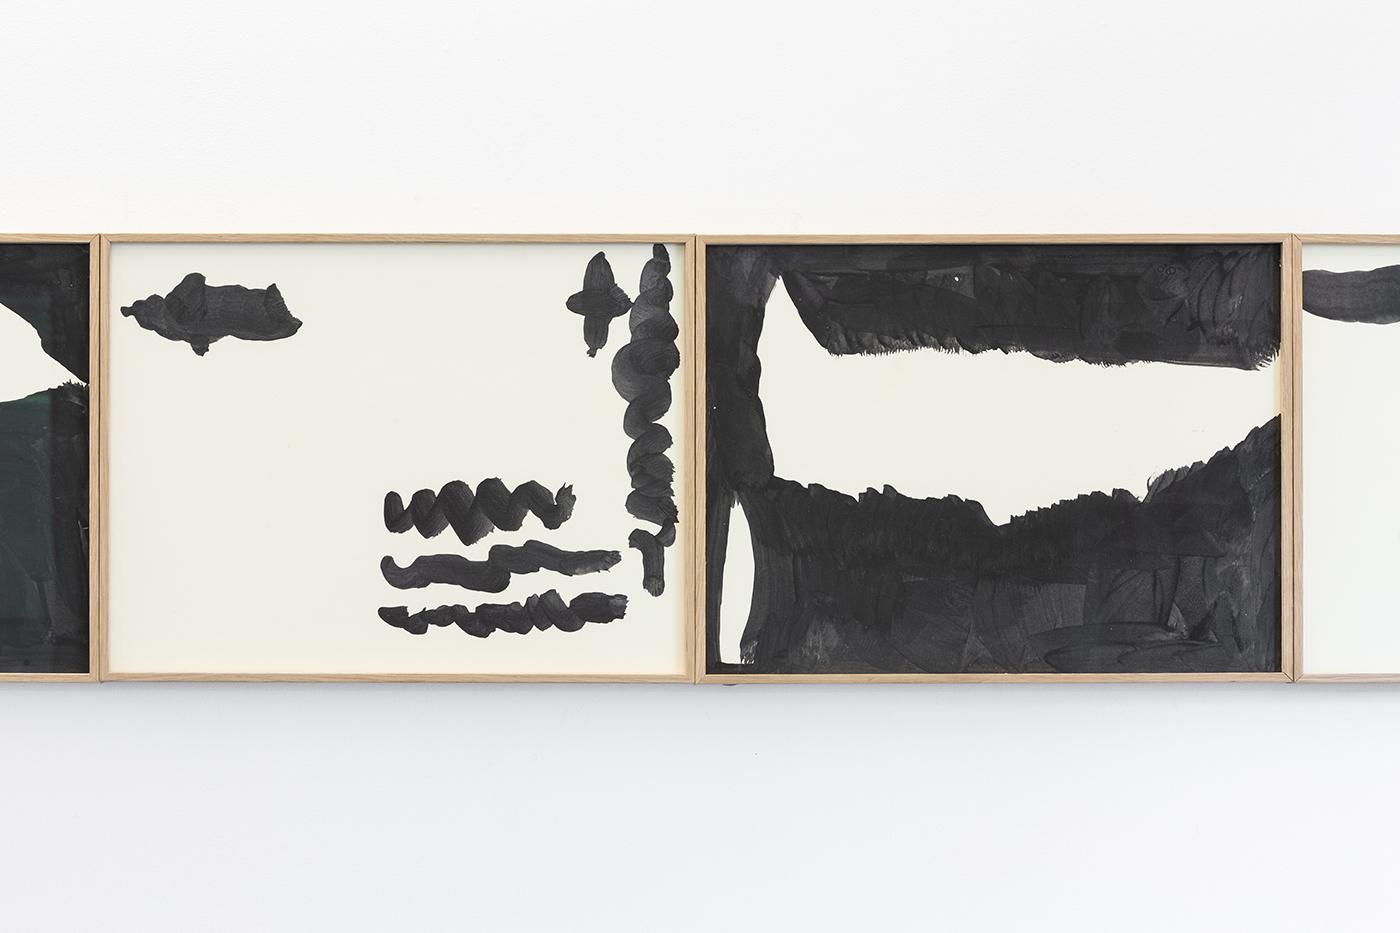 Mulholland Drive (Detail), 2019. Gouache on conservation museum cardboard. 31 x 44 cm